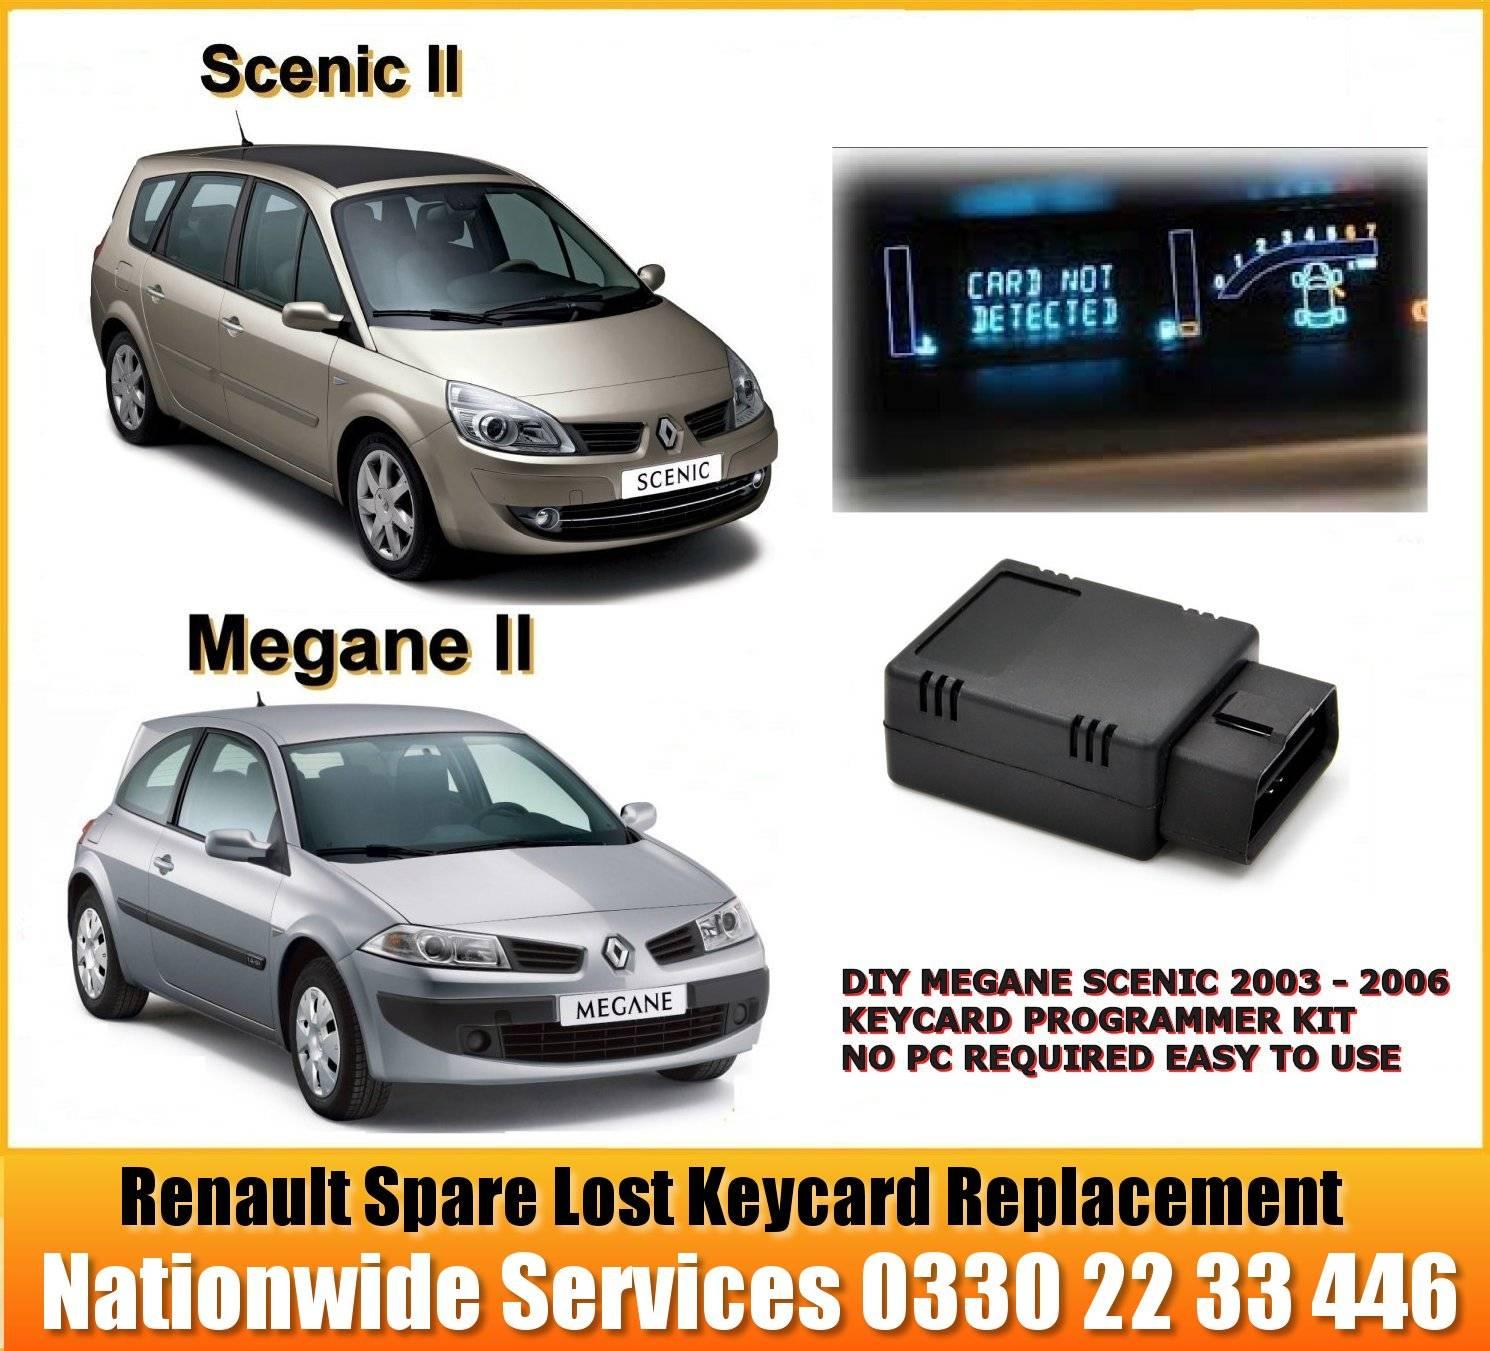 DIY_MEGANE_SCENIC_2003_-_2006_KEYCARD_PROGRAMMER_KIT_NO_PC_REQUIRED_PROGRAMMING